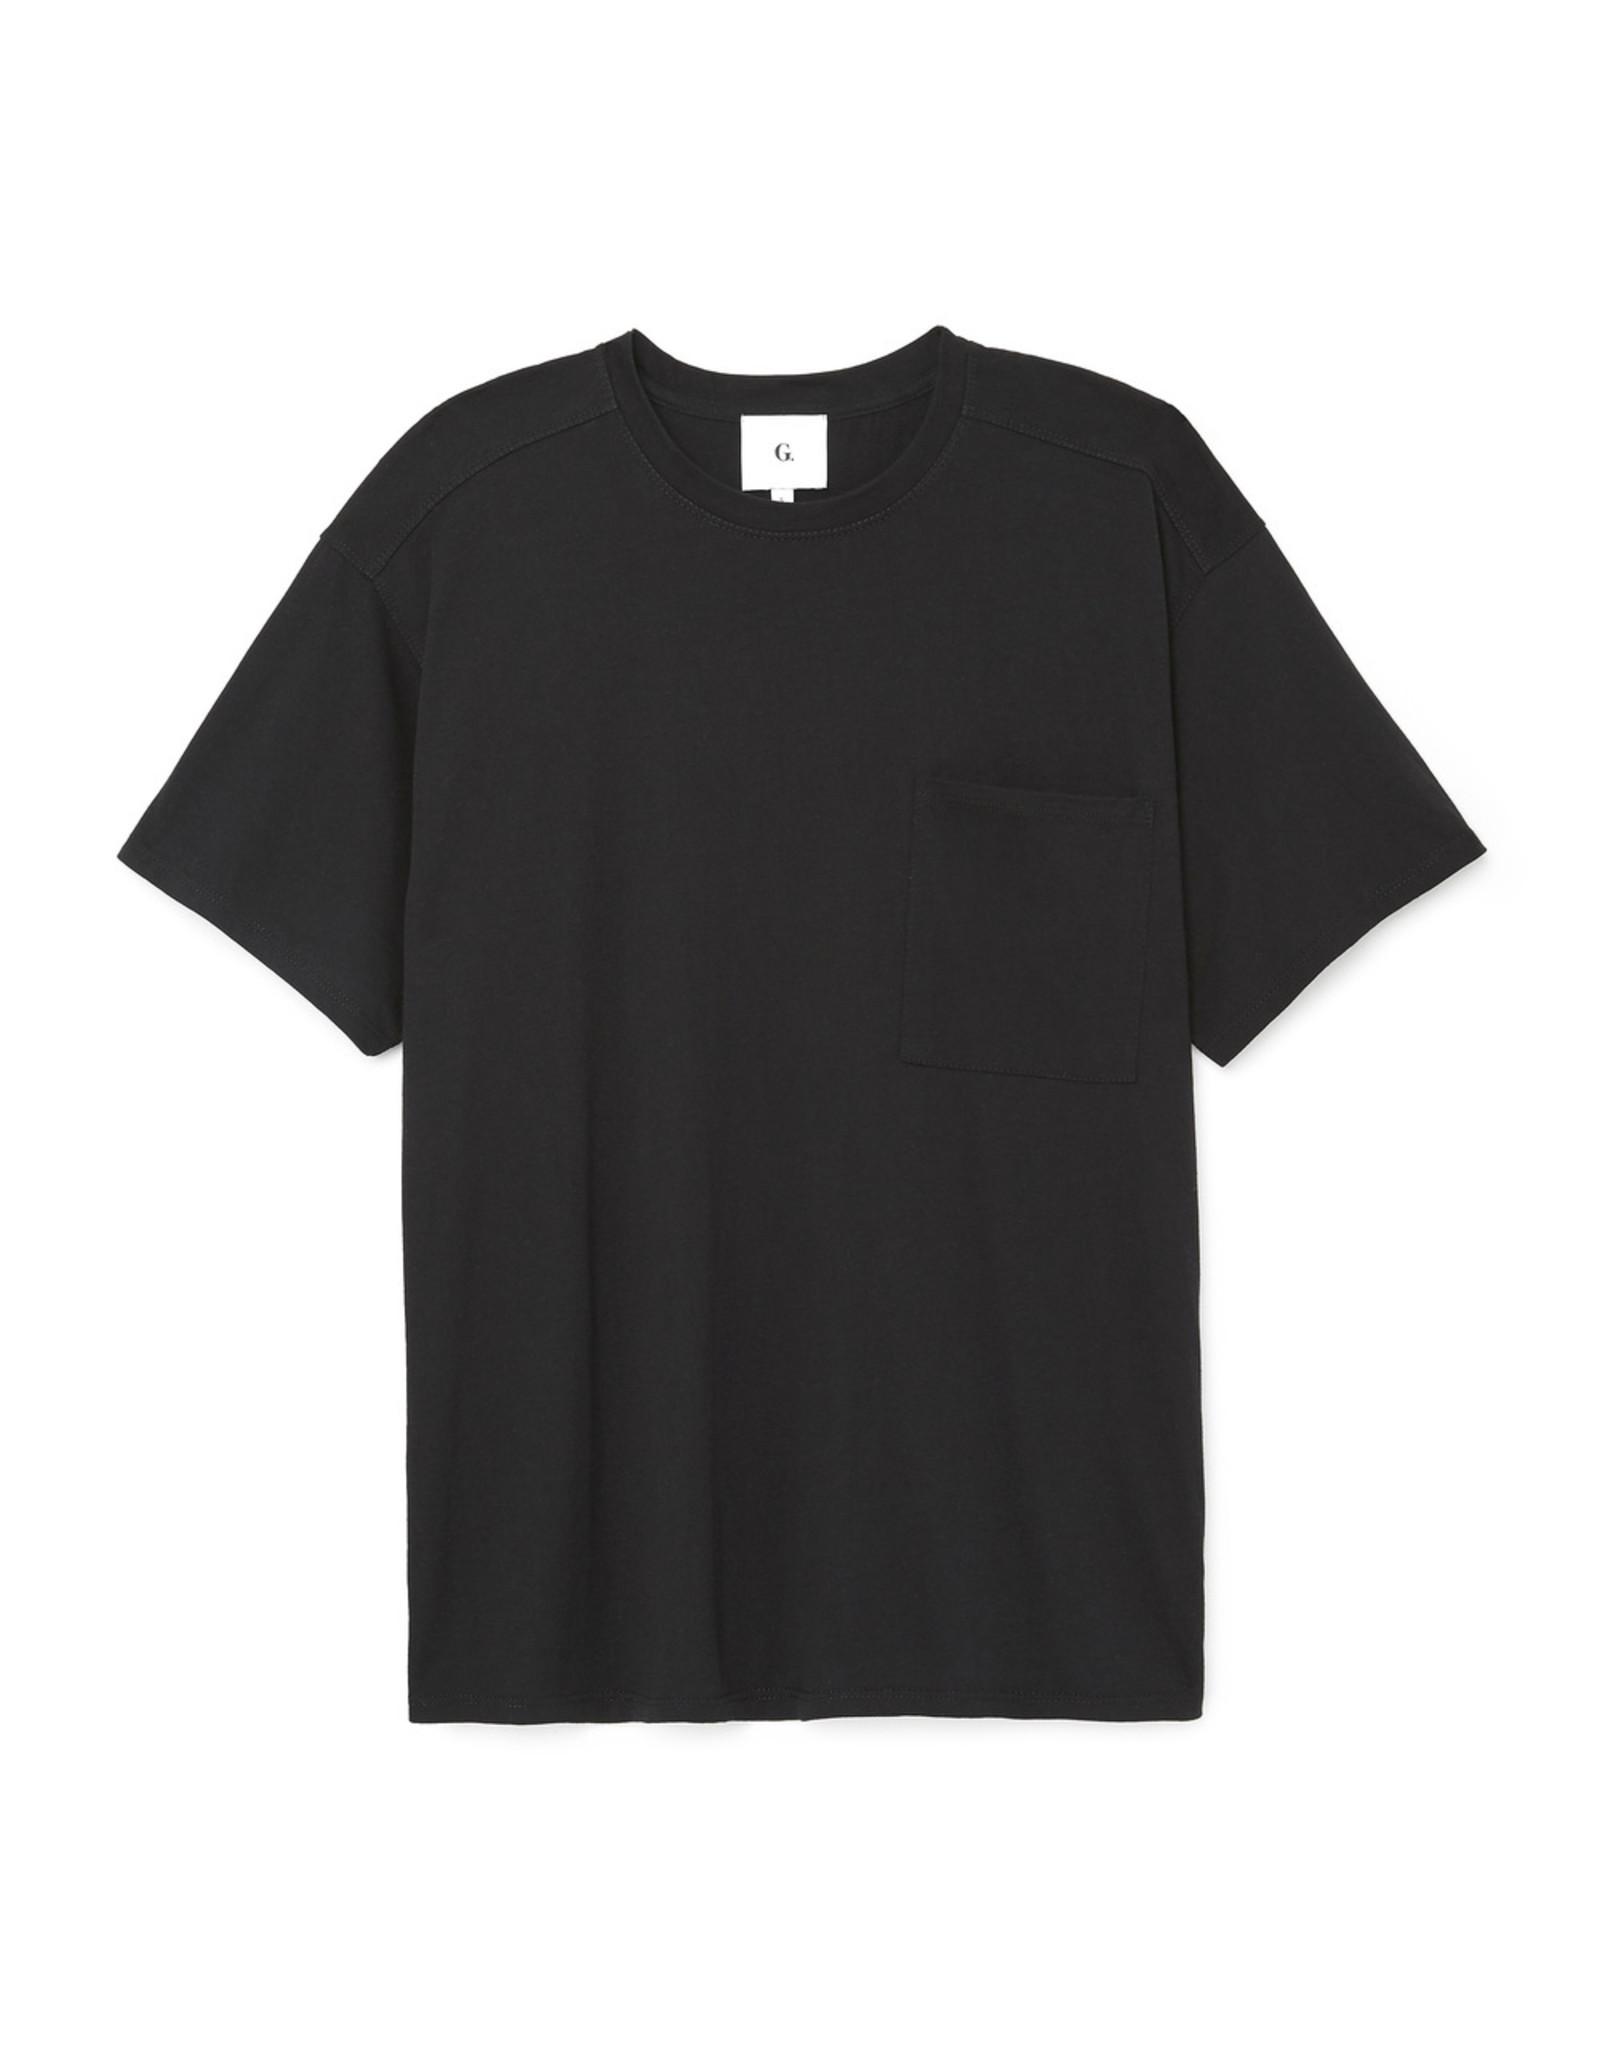 G. Sport G. Sport Oversize Boyfriend Tee (Color: Black, Size: S)